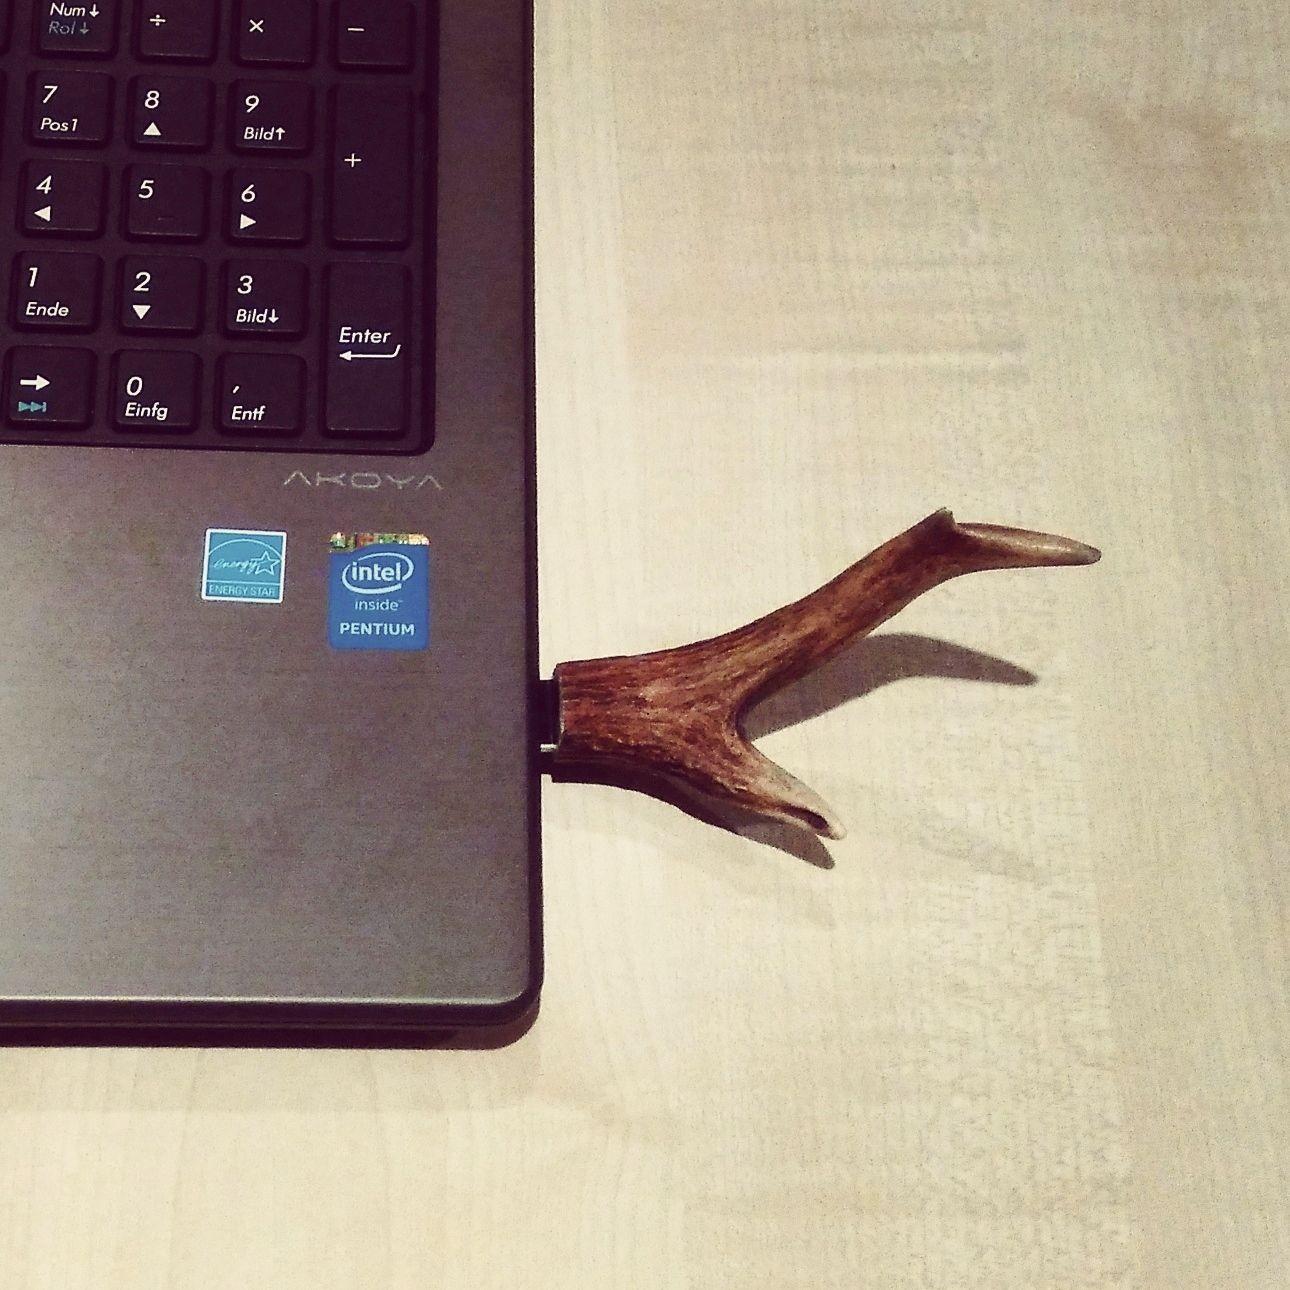 DIY Hirsch USB Stick für Jäger | DIY | Pinterest | Die jäger, Horn ...